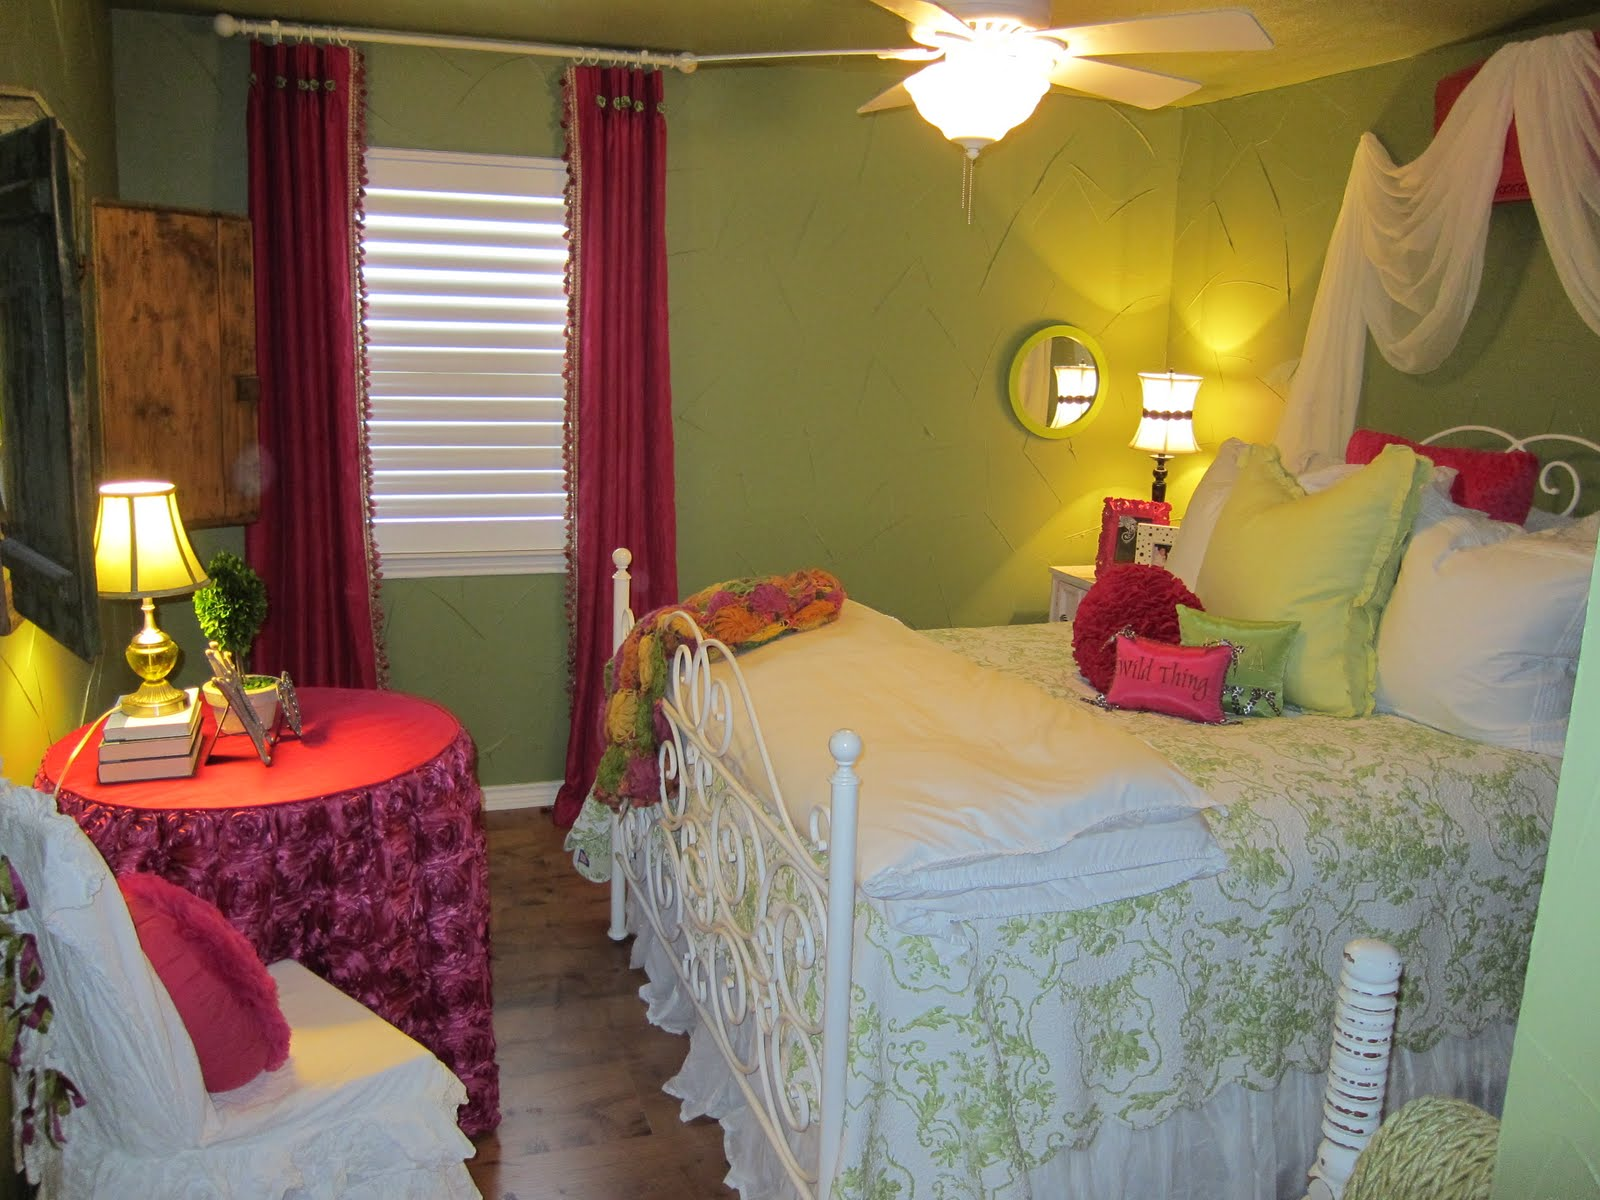 kbm designs  girly room